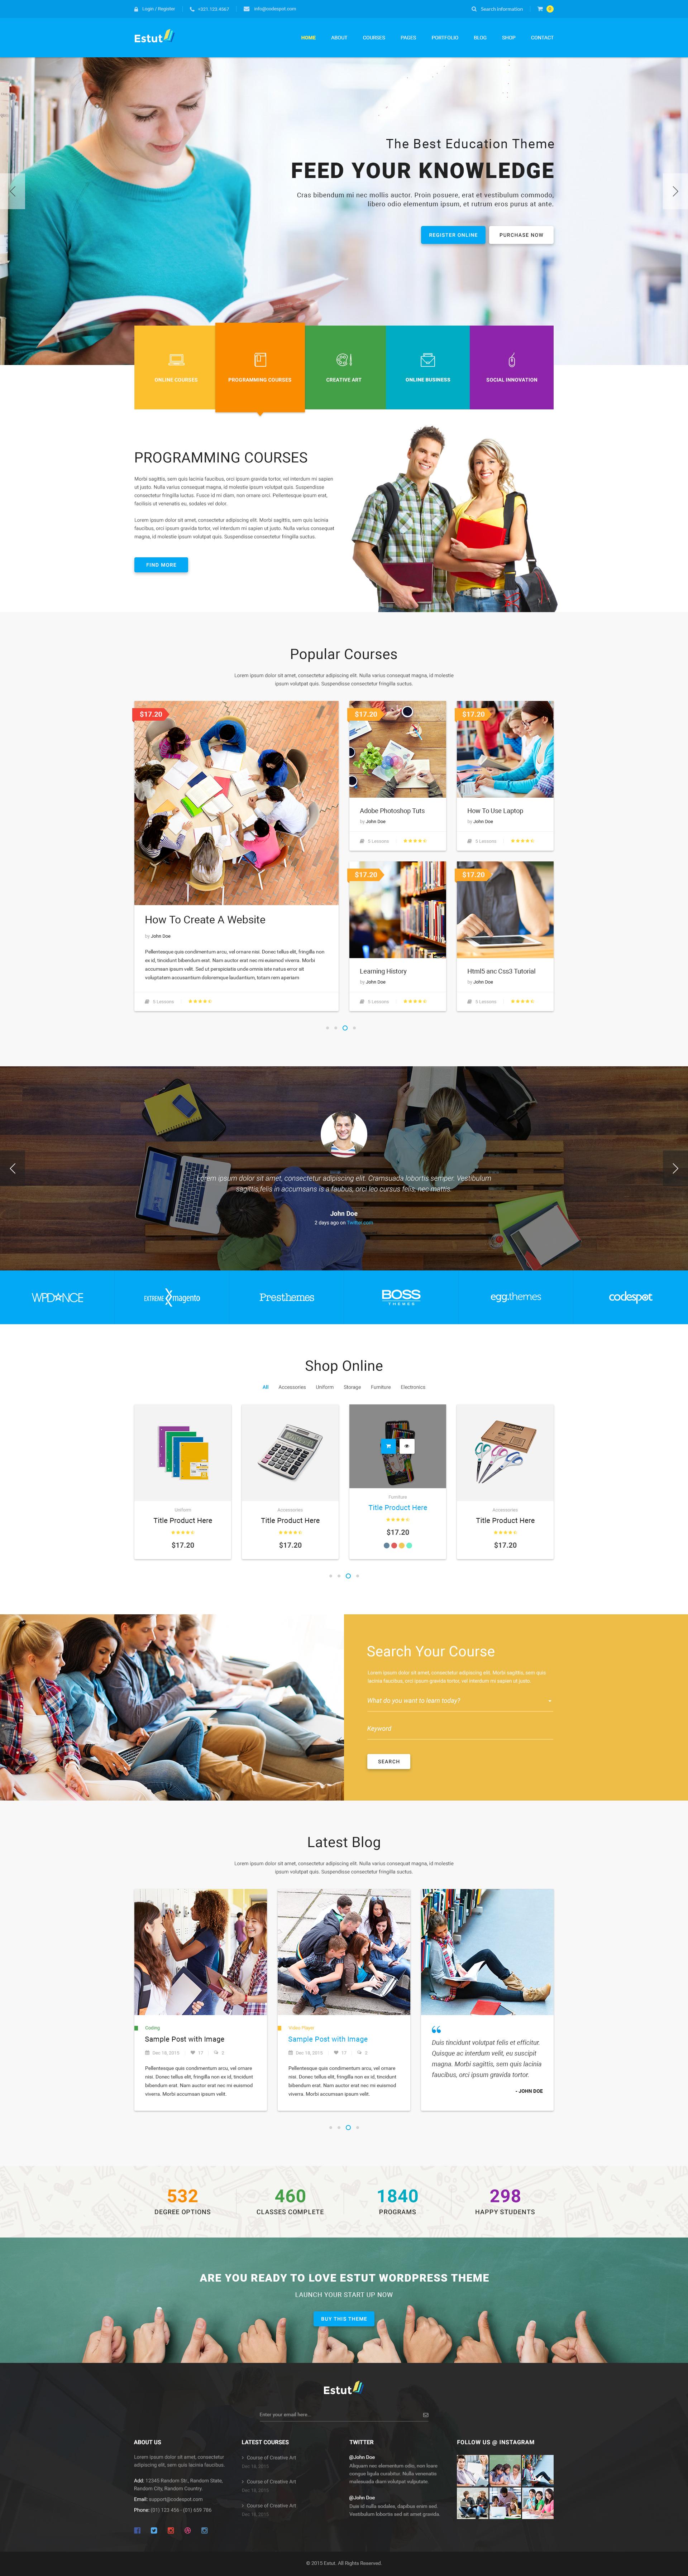 Estut   Education WordPress Theme - Material Design - Online Course ...